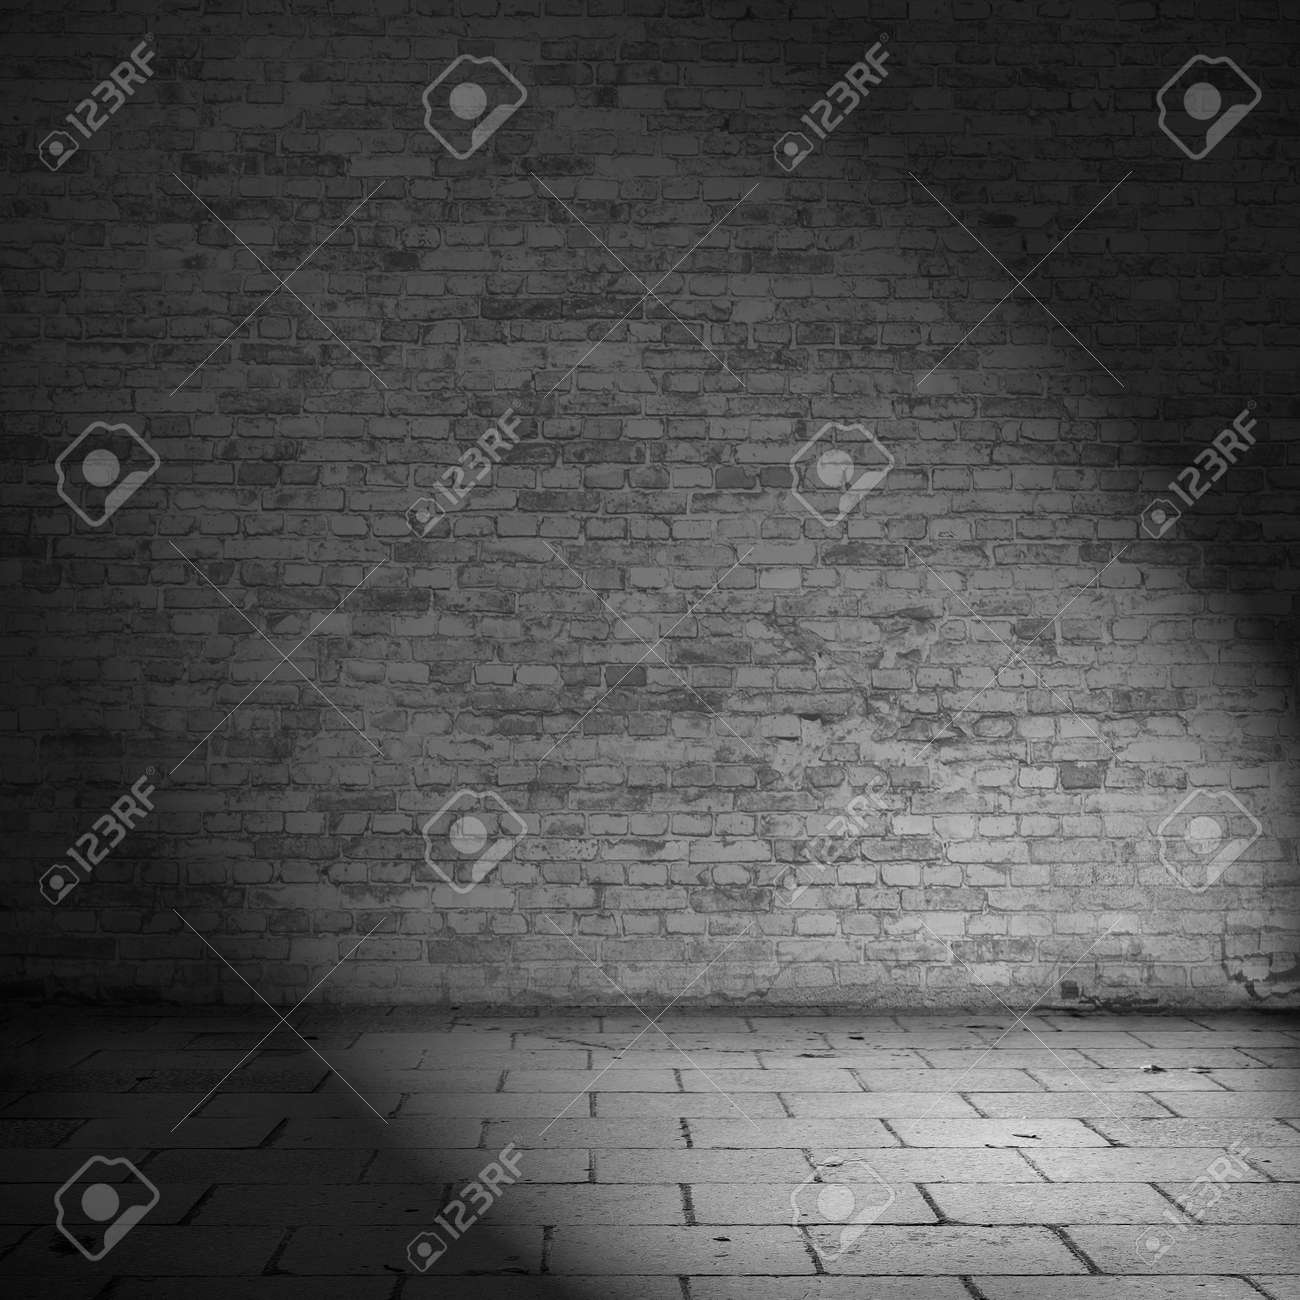 Black brick wall interior - Brick Wall Texture Background Abandoned House Interior Black And White Illustration Stock Illustration 37421580